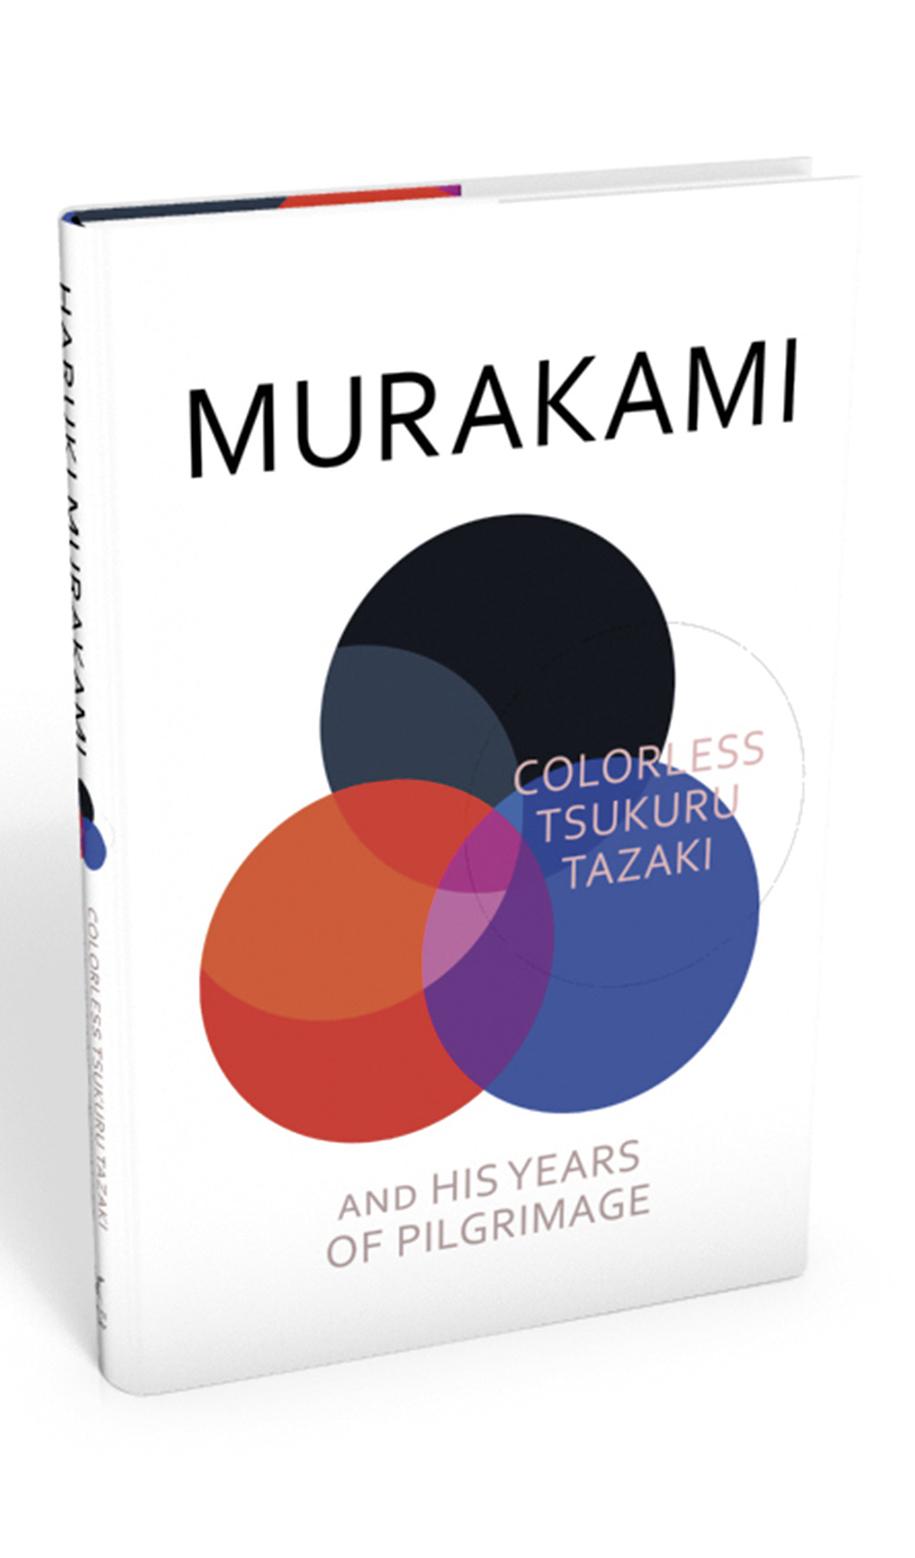 La última novela de Haruki Murakami conquista a los lectores